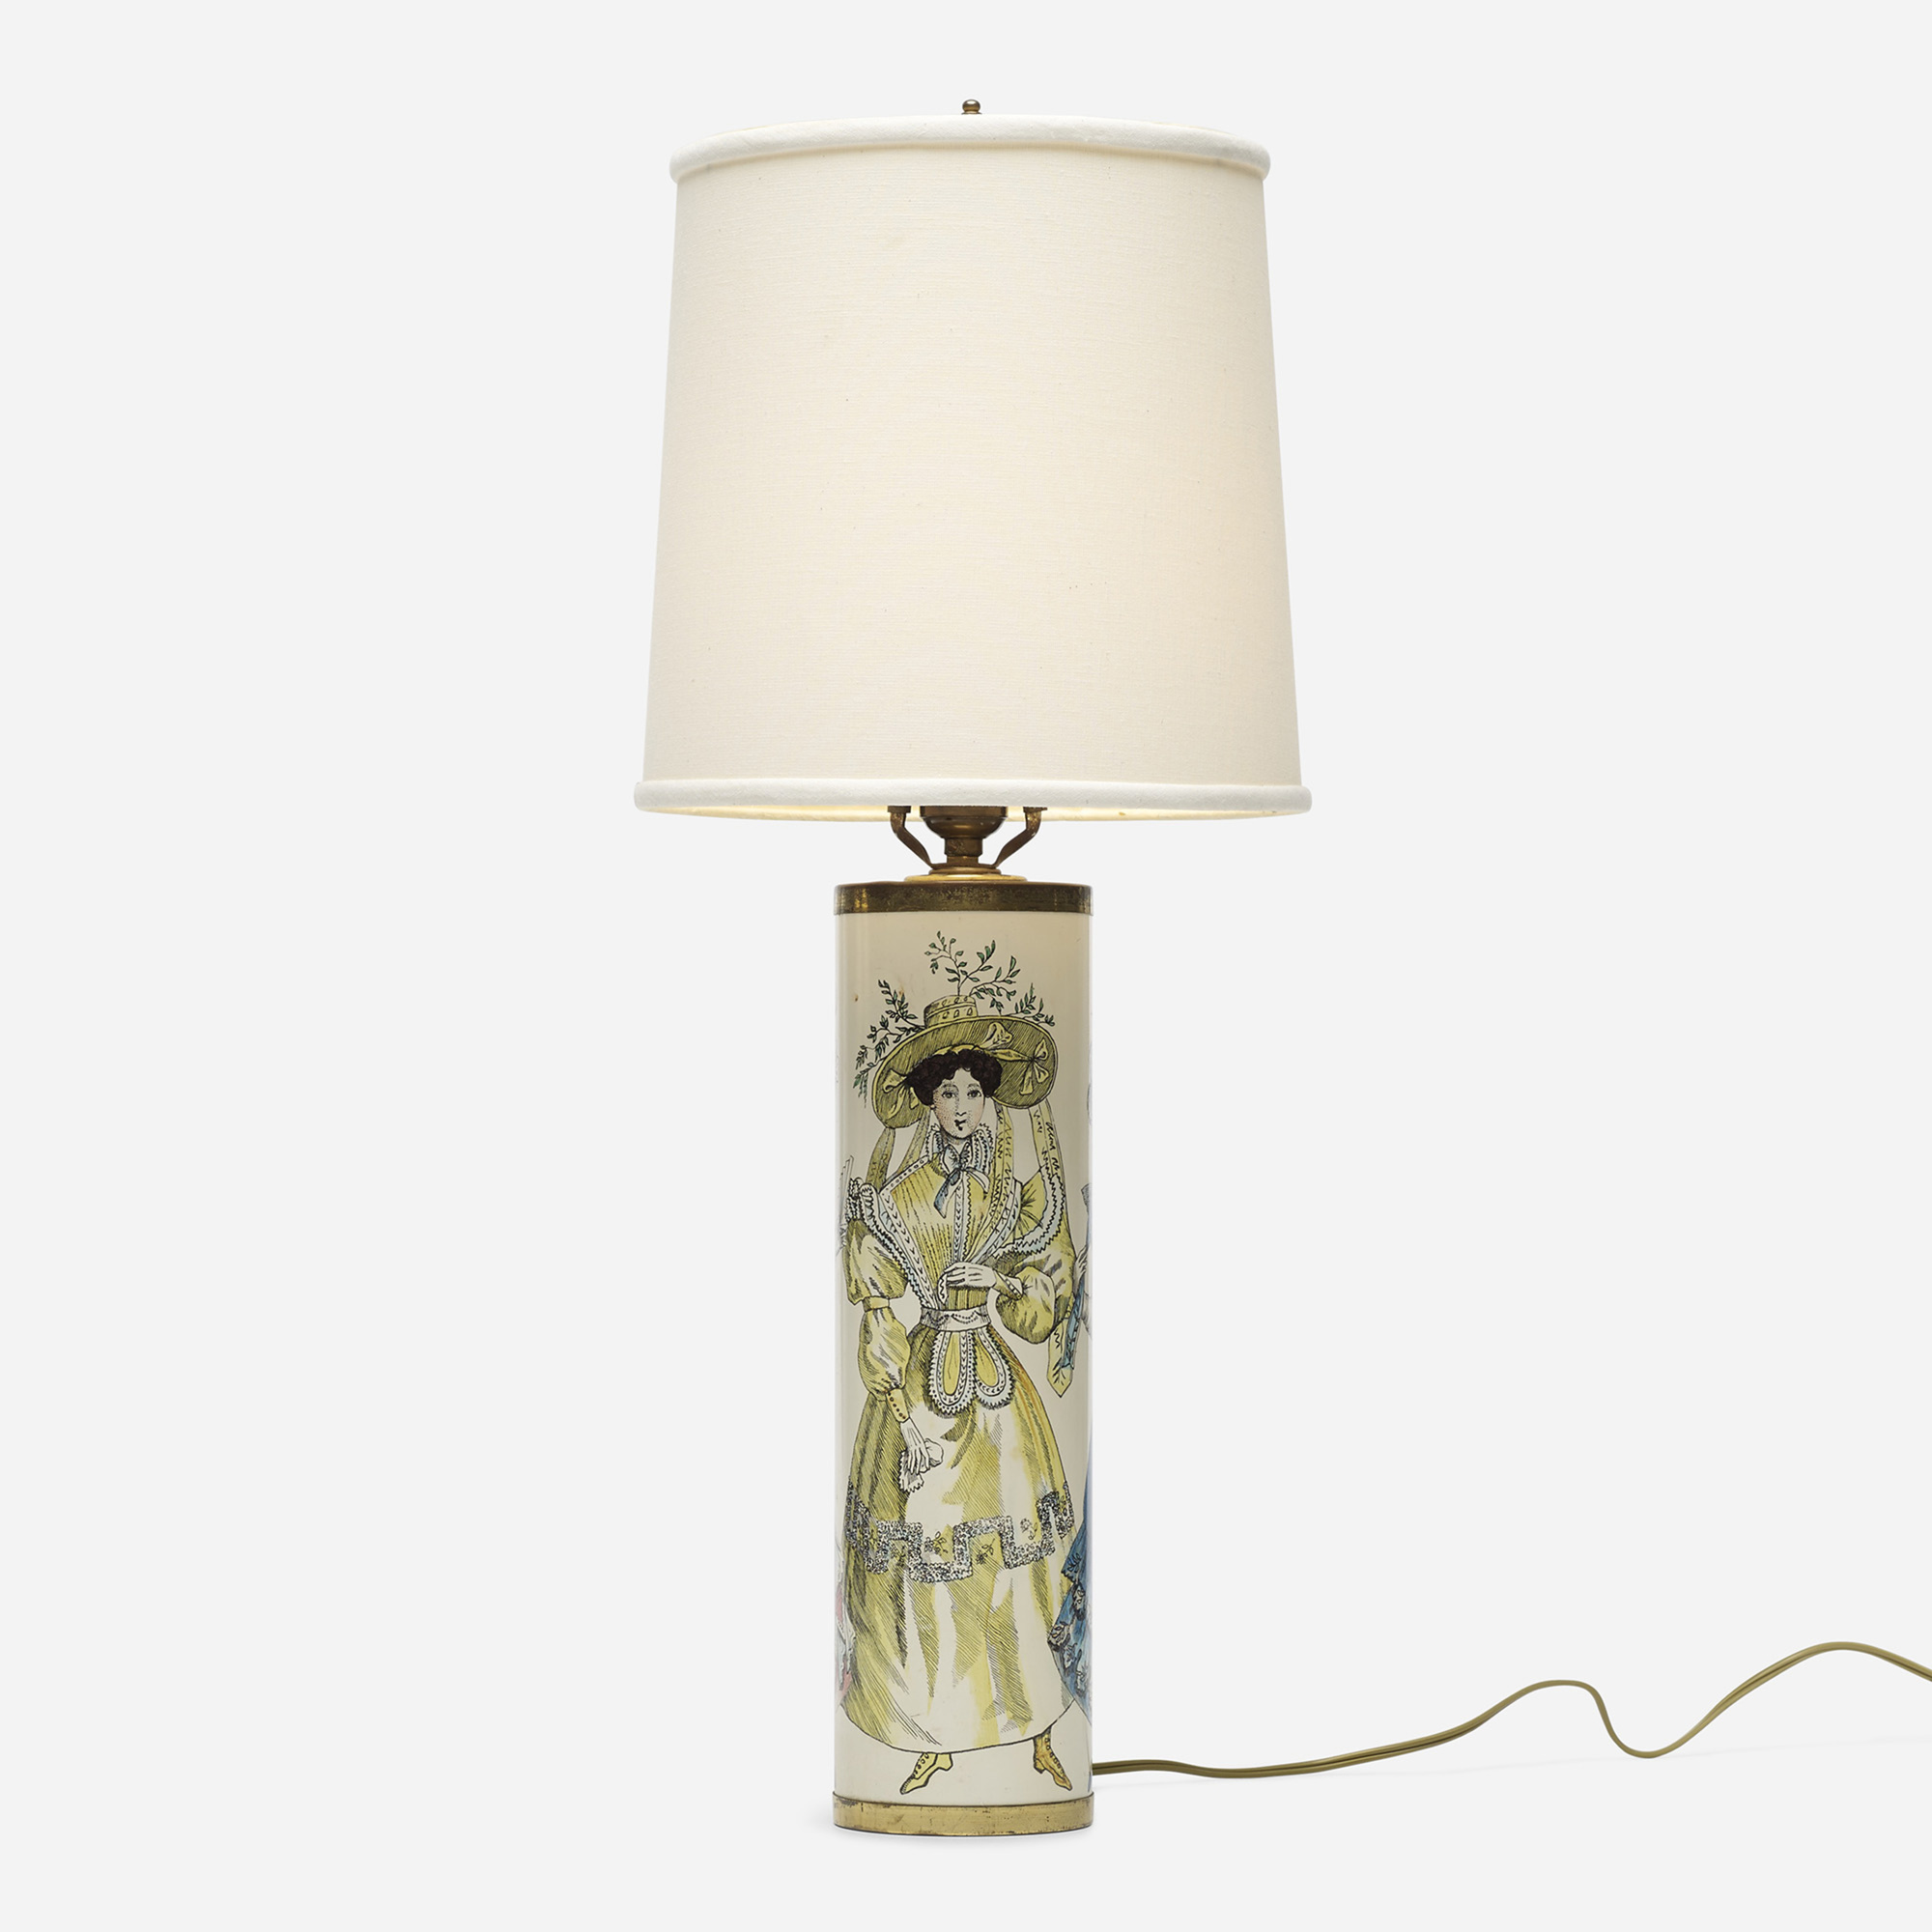 286: Piero Fornasetti / Moda Femminile table lamp (1 of 3)